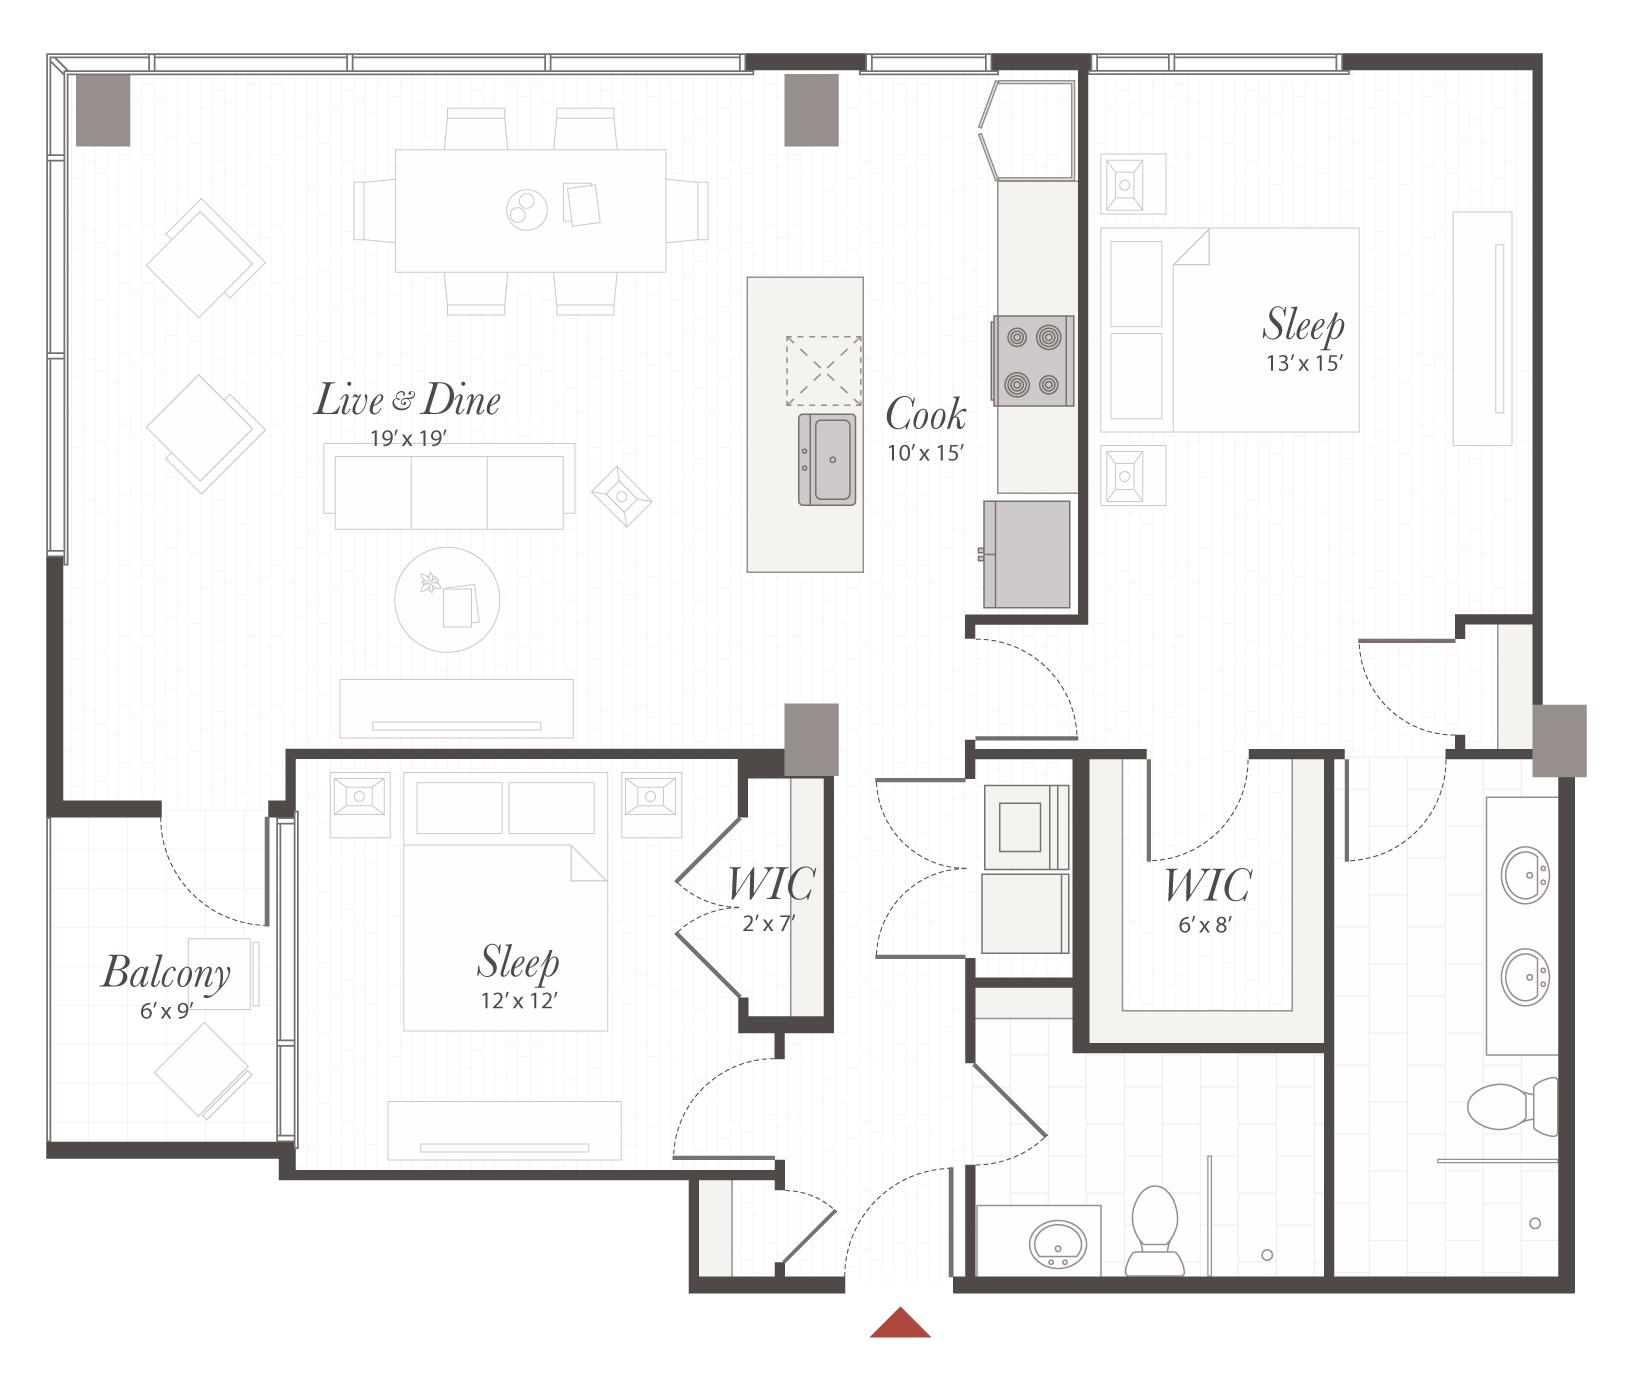 B1 2 bedroom apartment cincinnati encore apartments - 2 bedroom apartments in cincinnati ...